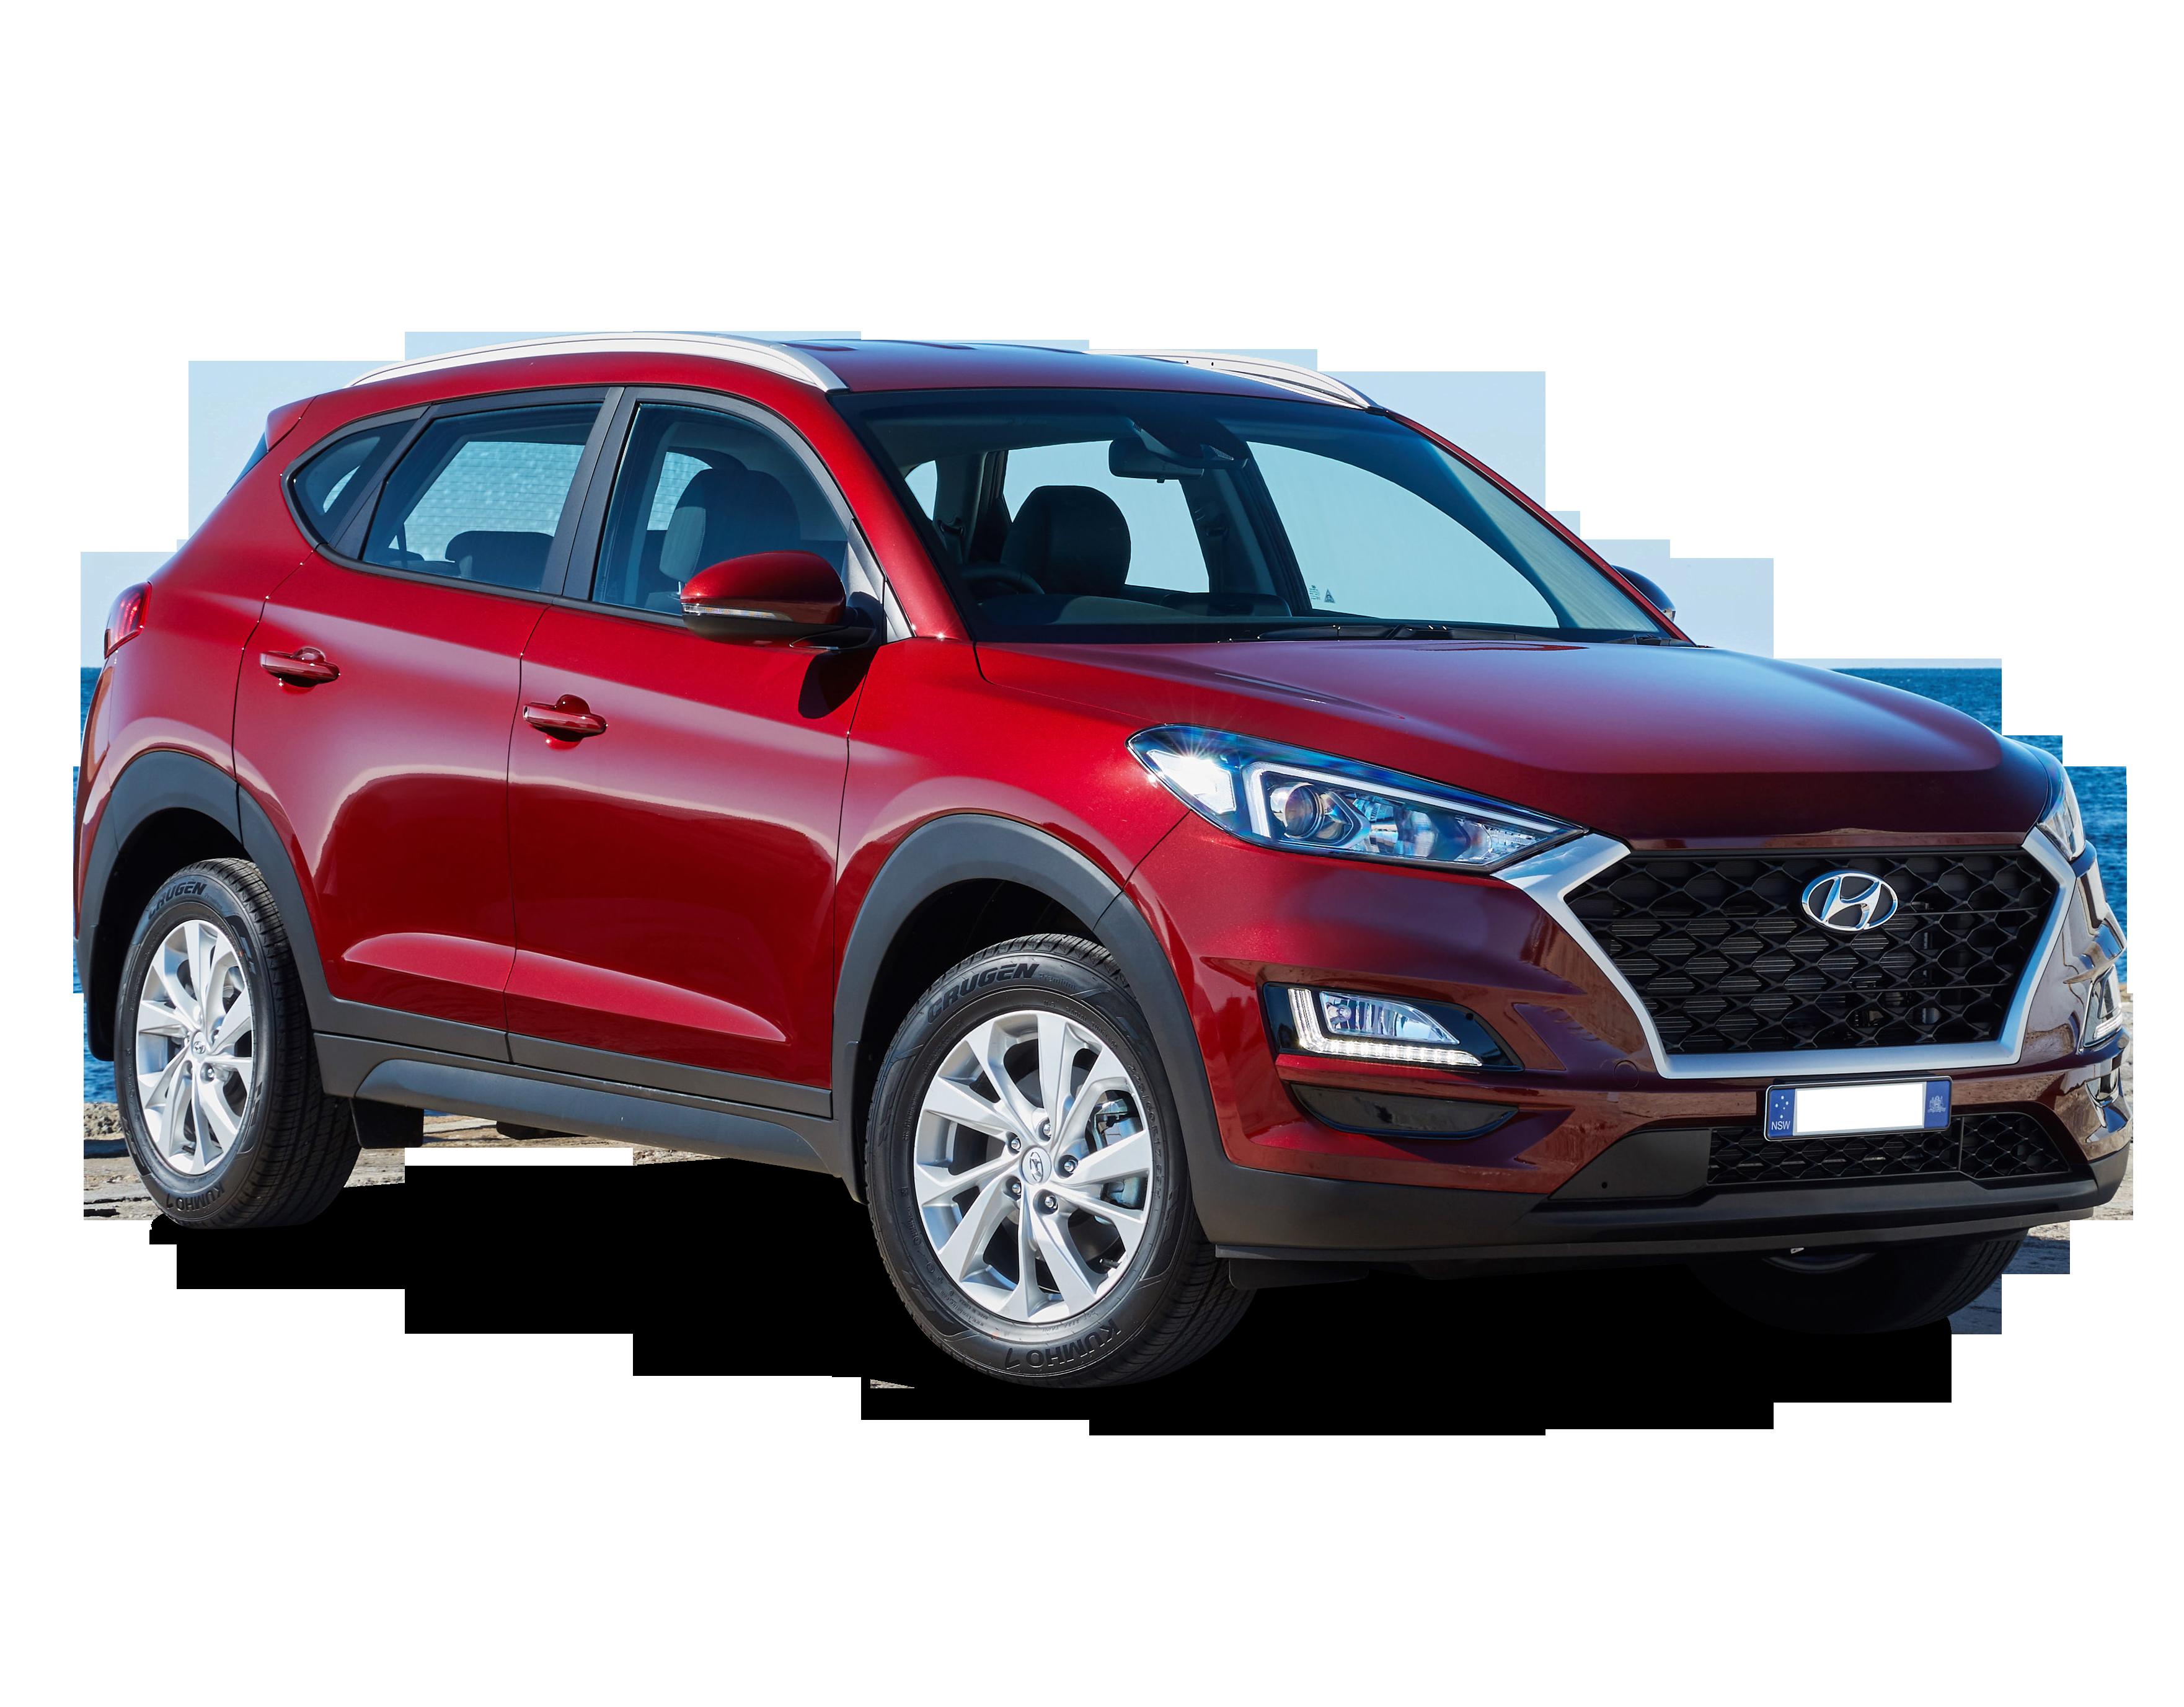 Hyundai Tucson Review For Sale Price Colours Interior Specs Carsguide